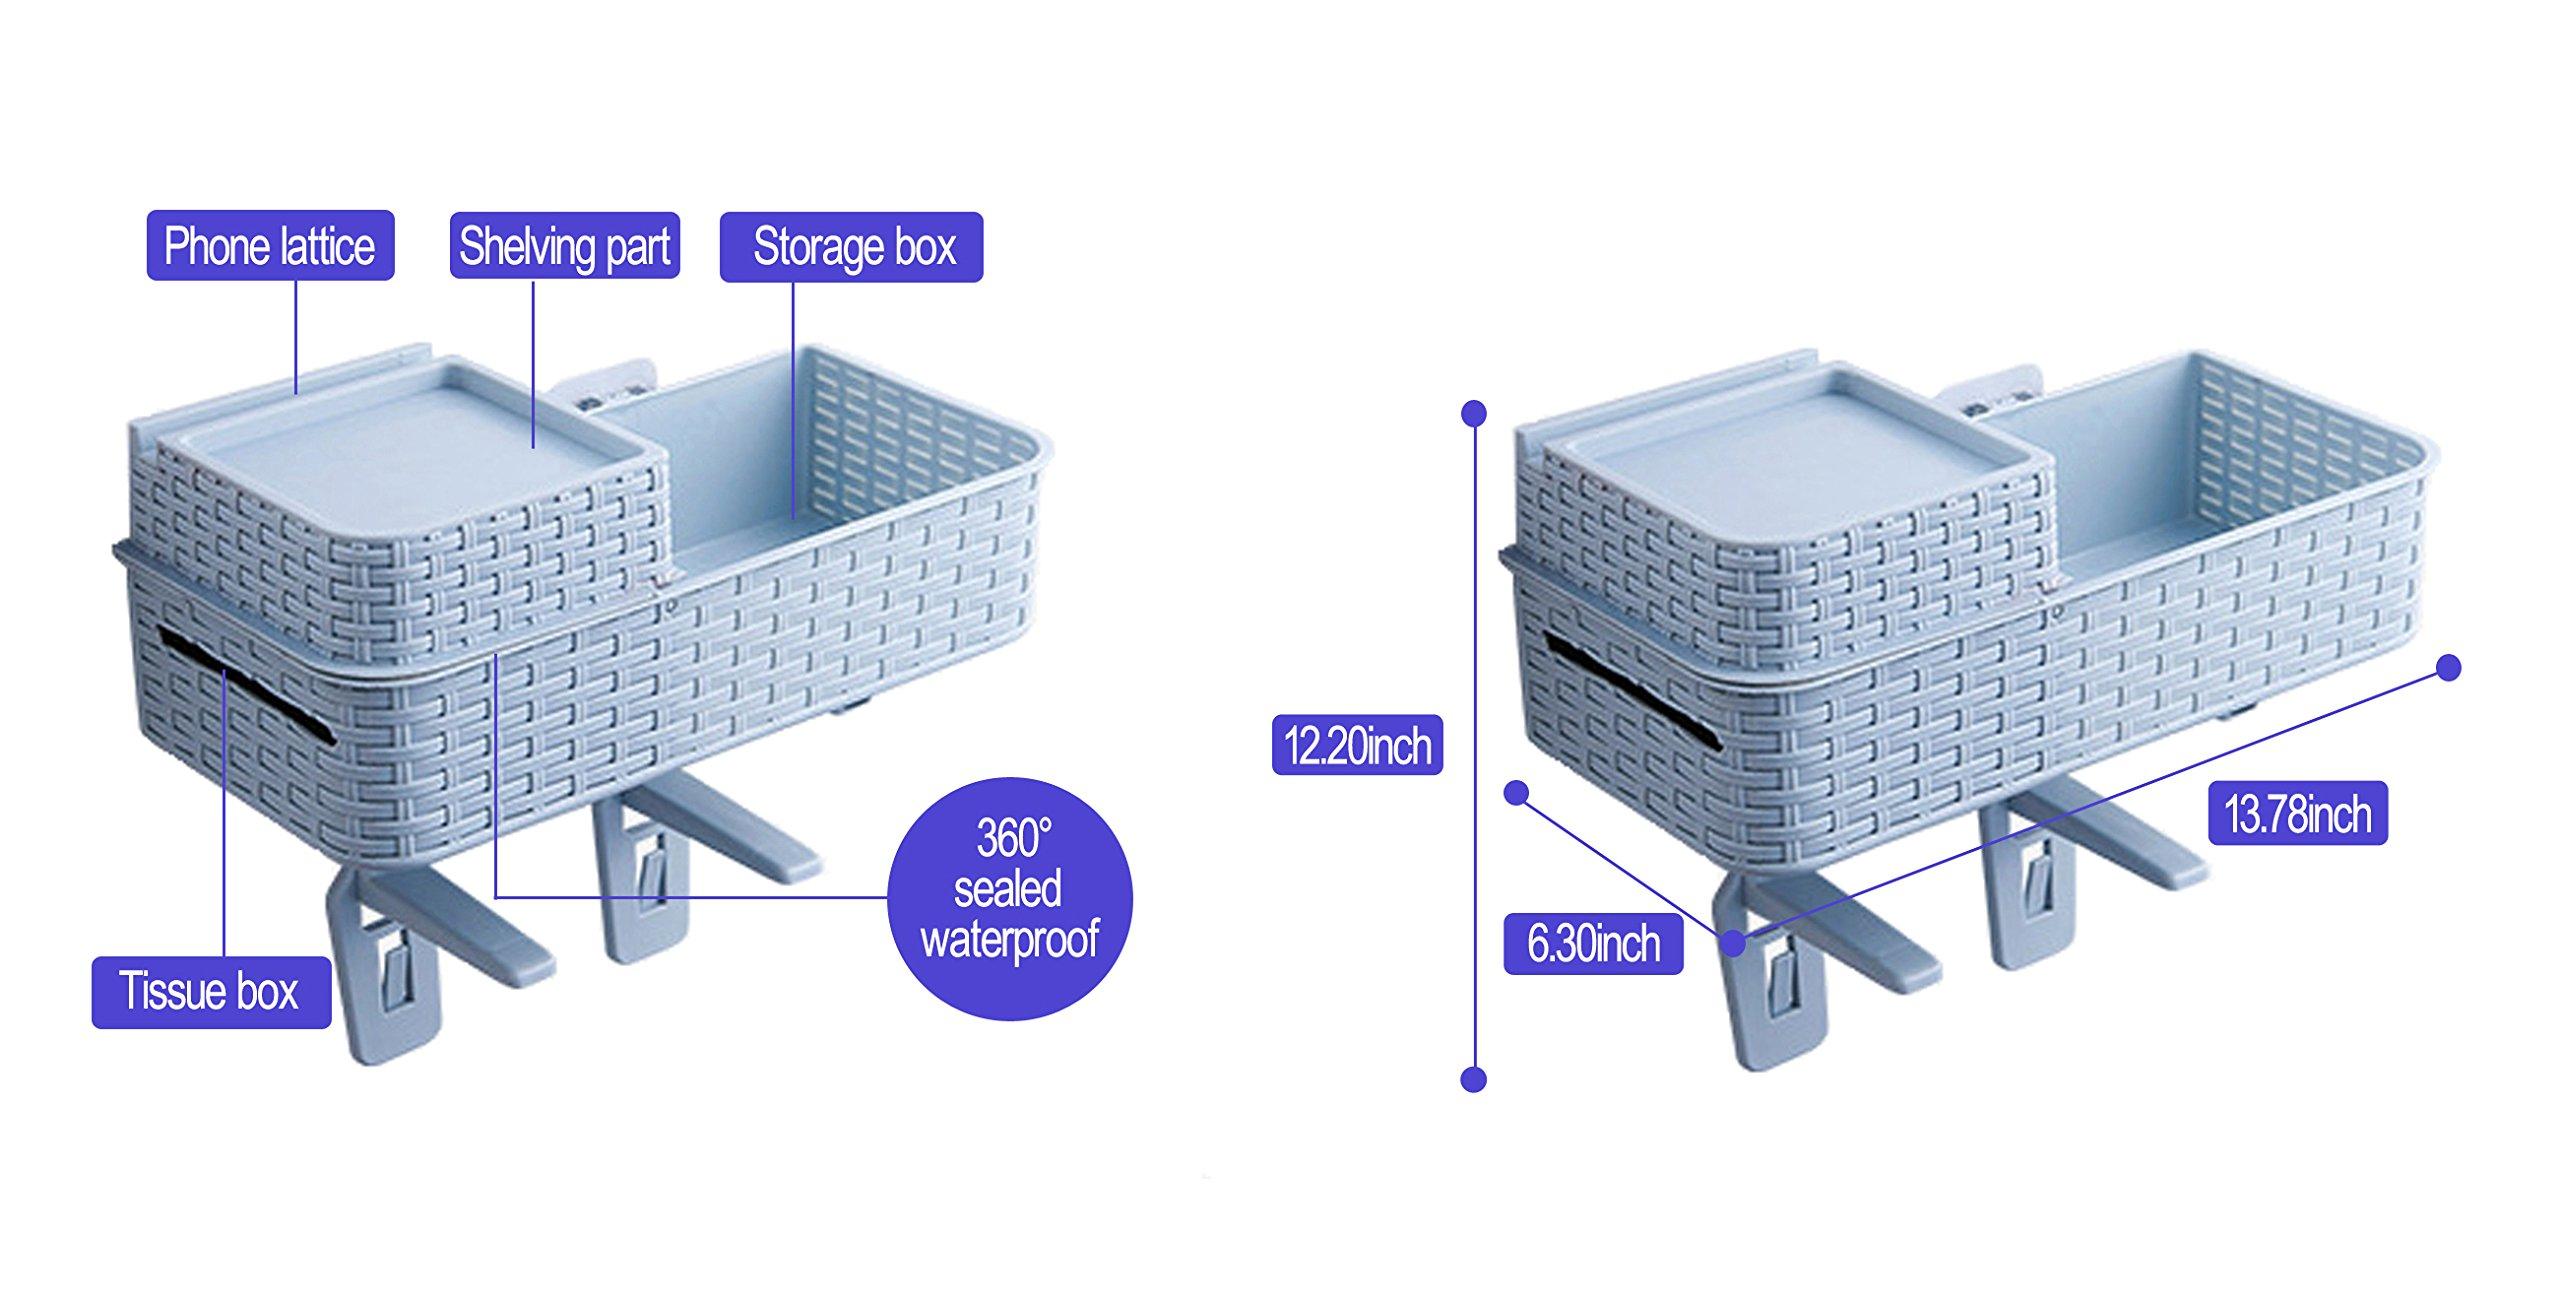 Acstar Multi-functional Suction Wall Toilet Rack Bathroom Hanging Storage Rack Kitchen Storage Basket Desktop Storage Basket Exempt from Punching Waterproof (Light blue) by Acstar (Image #3)